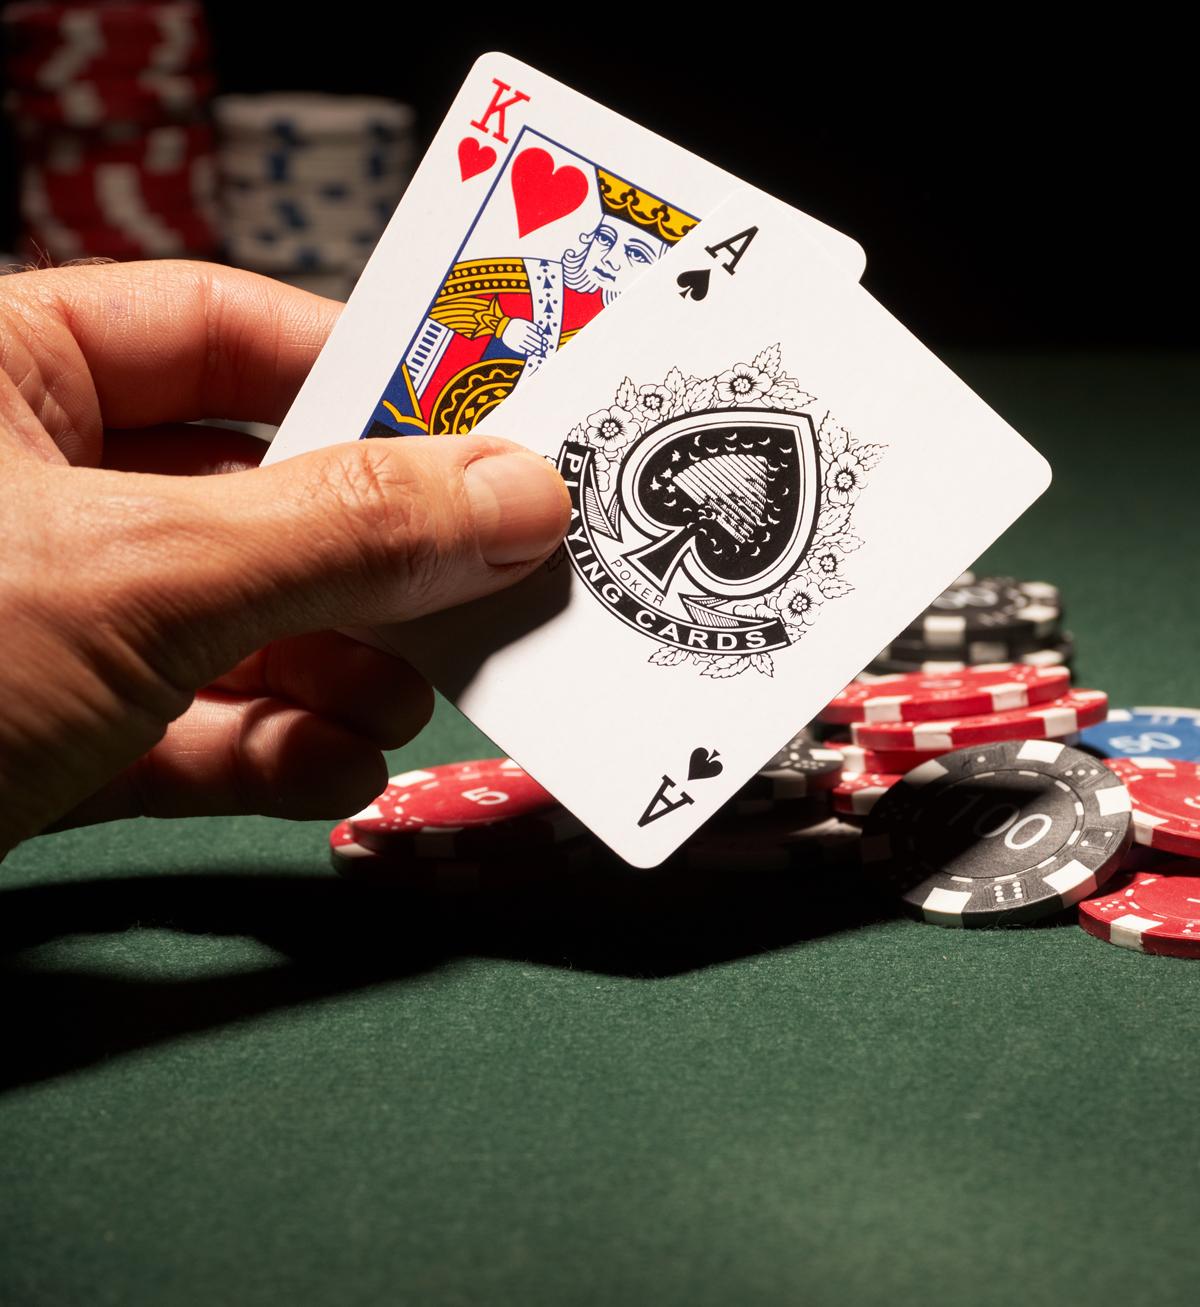 Where to play blackjack in vegas